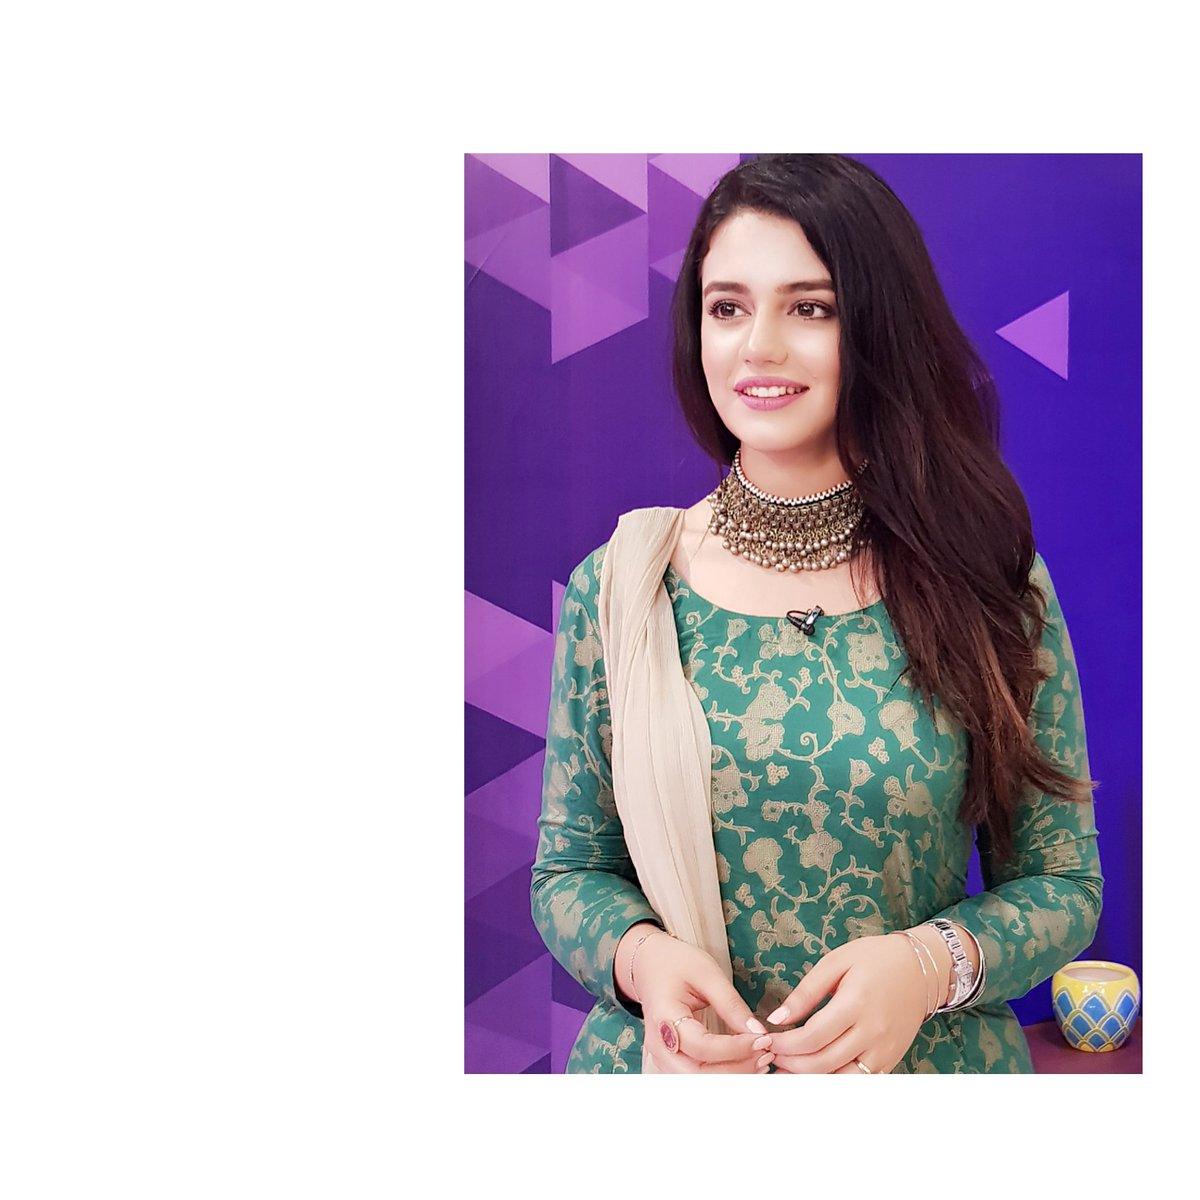 0930dc77 Zara Noor Abbas Siddiqui on Twitter: